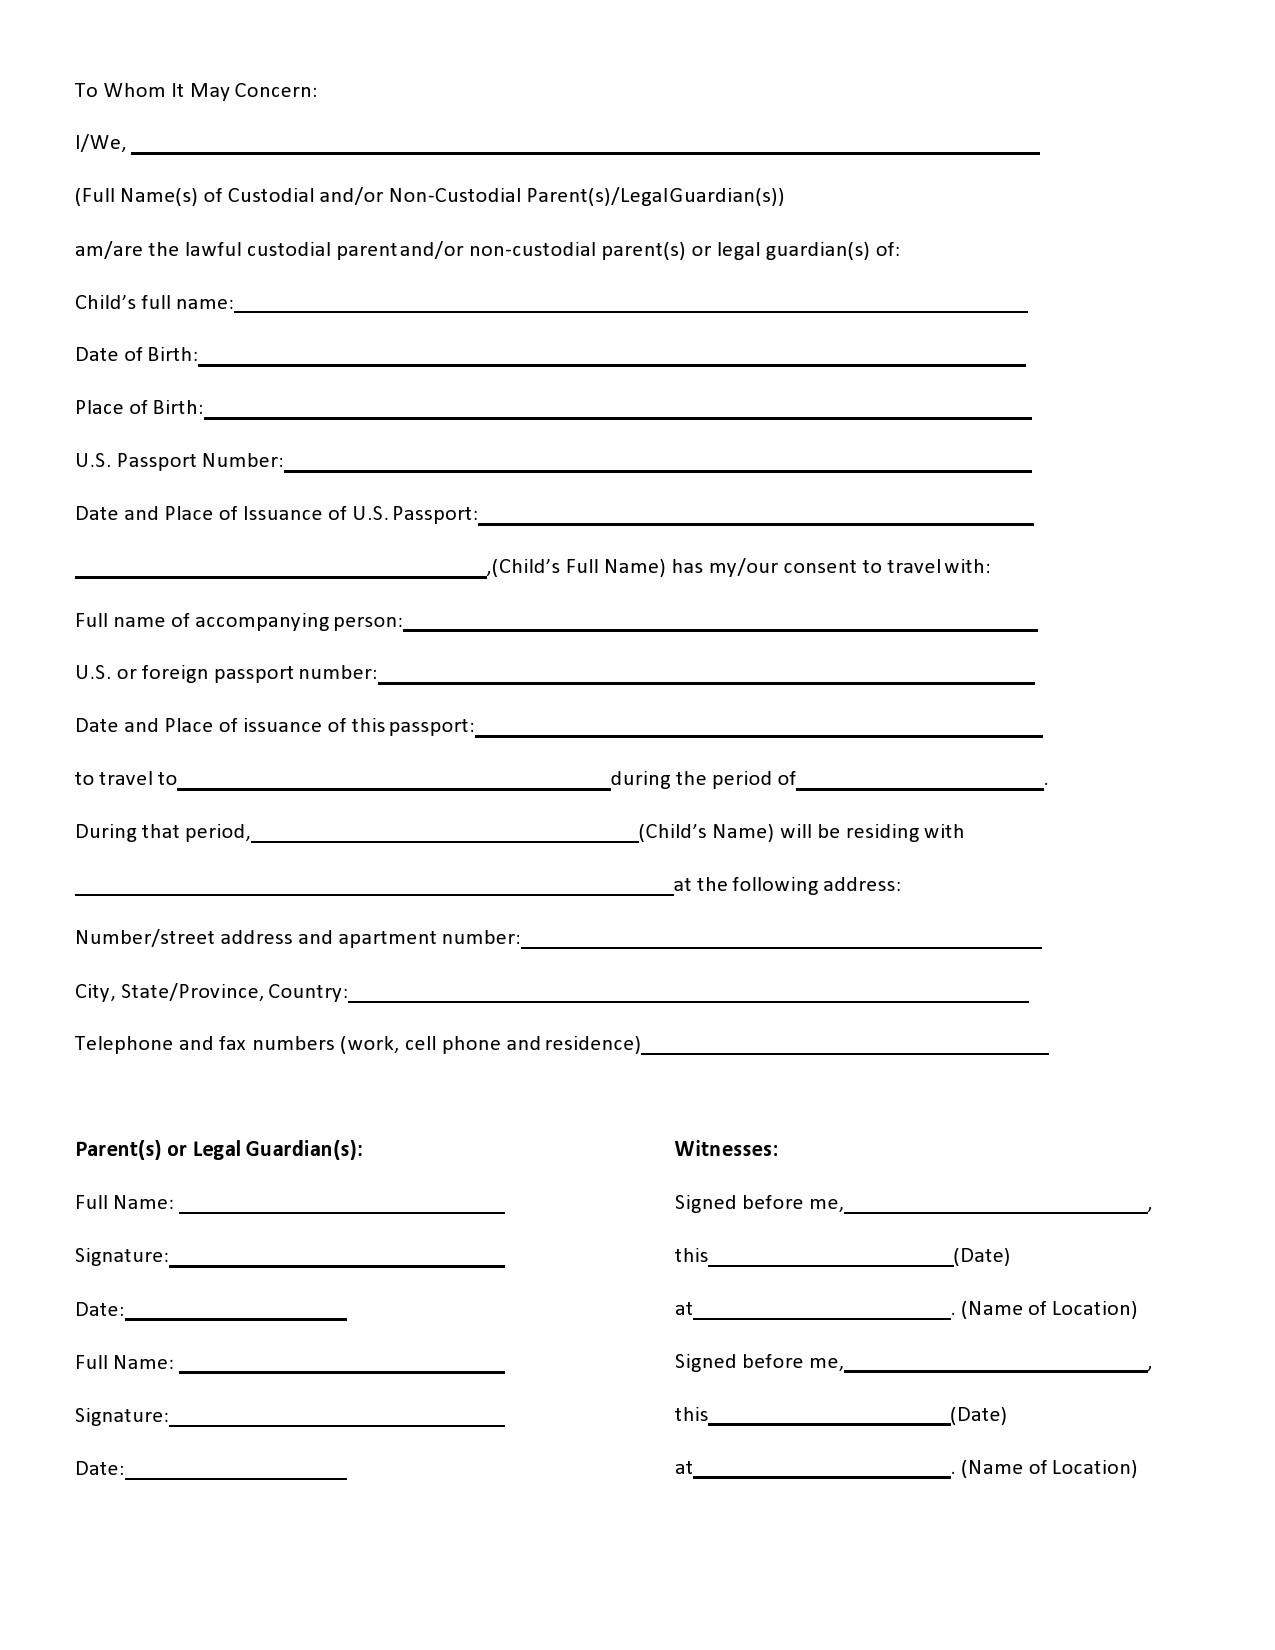 Free child travel consent form 05